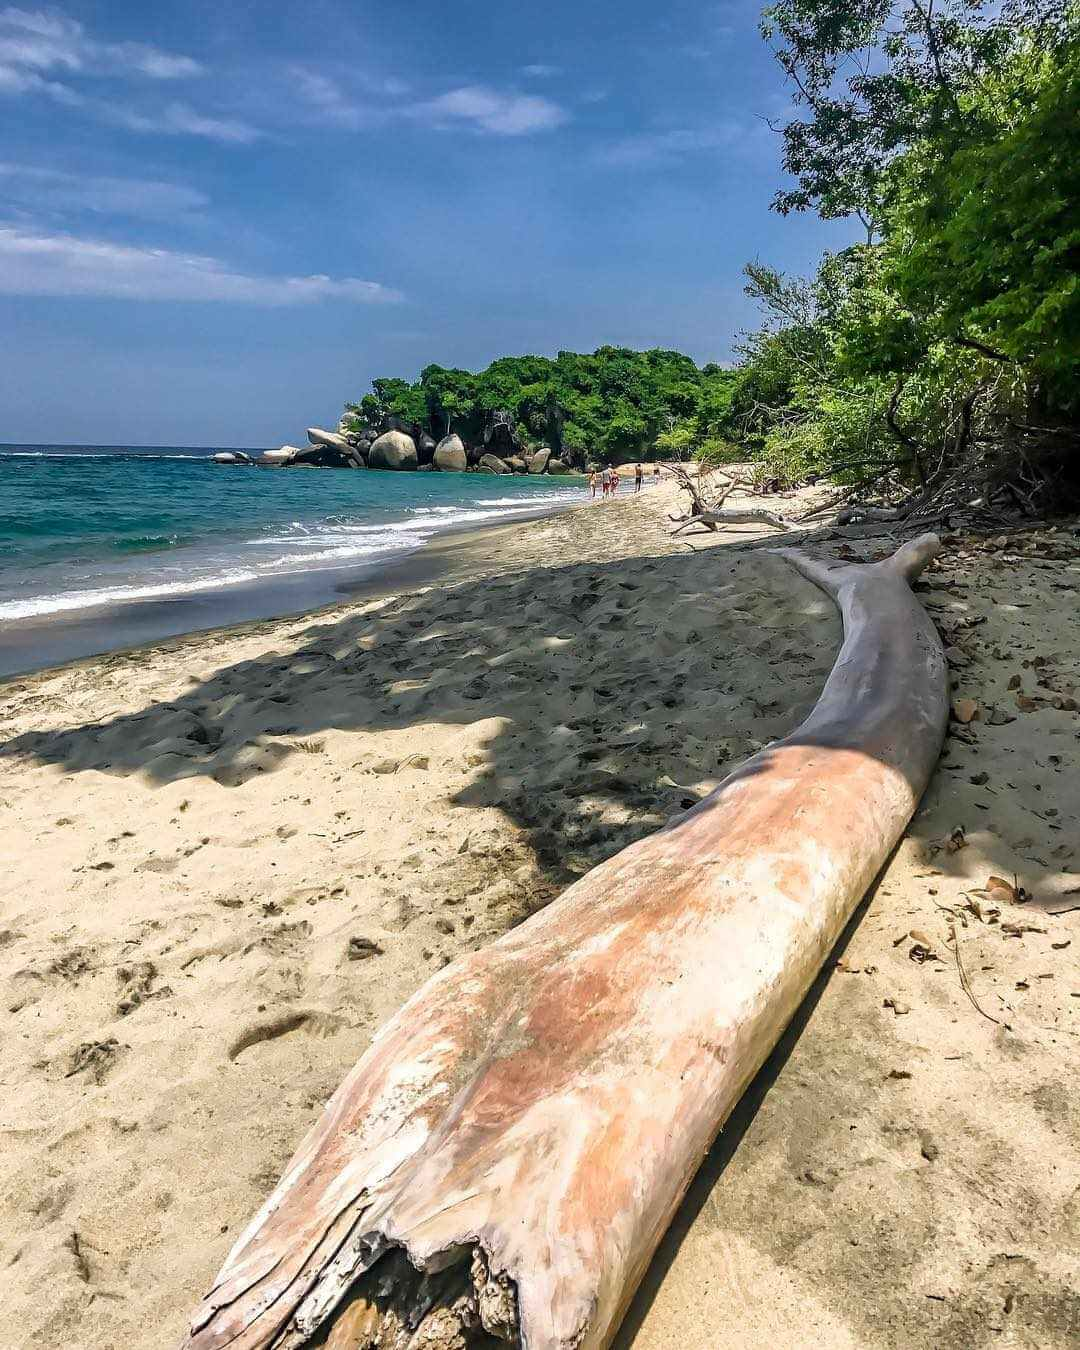 Playa solitaria del parque Tayrona